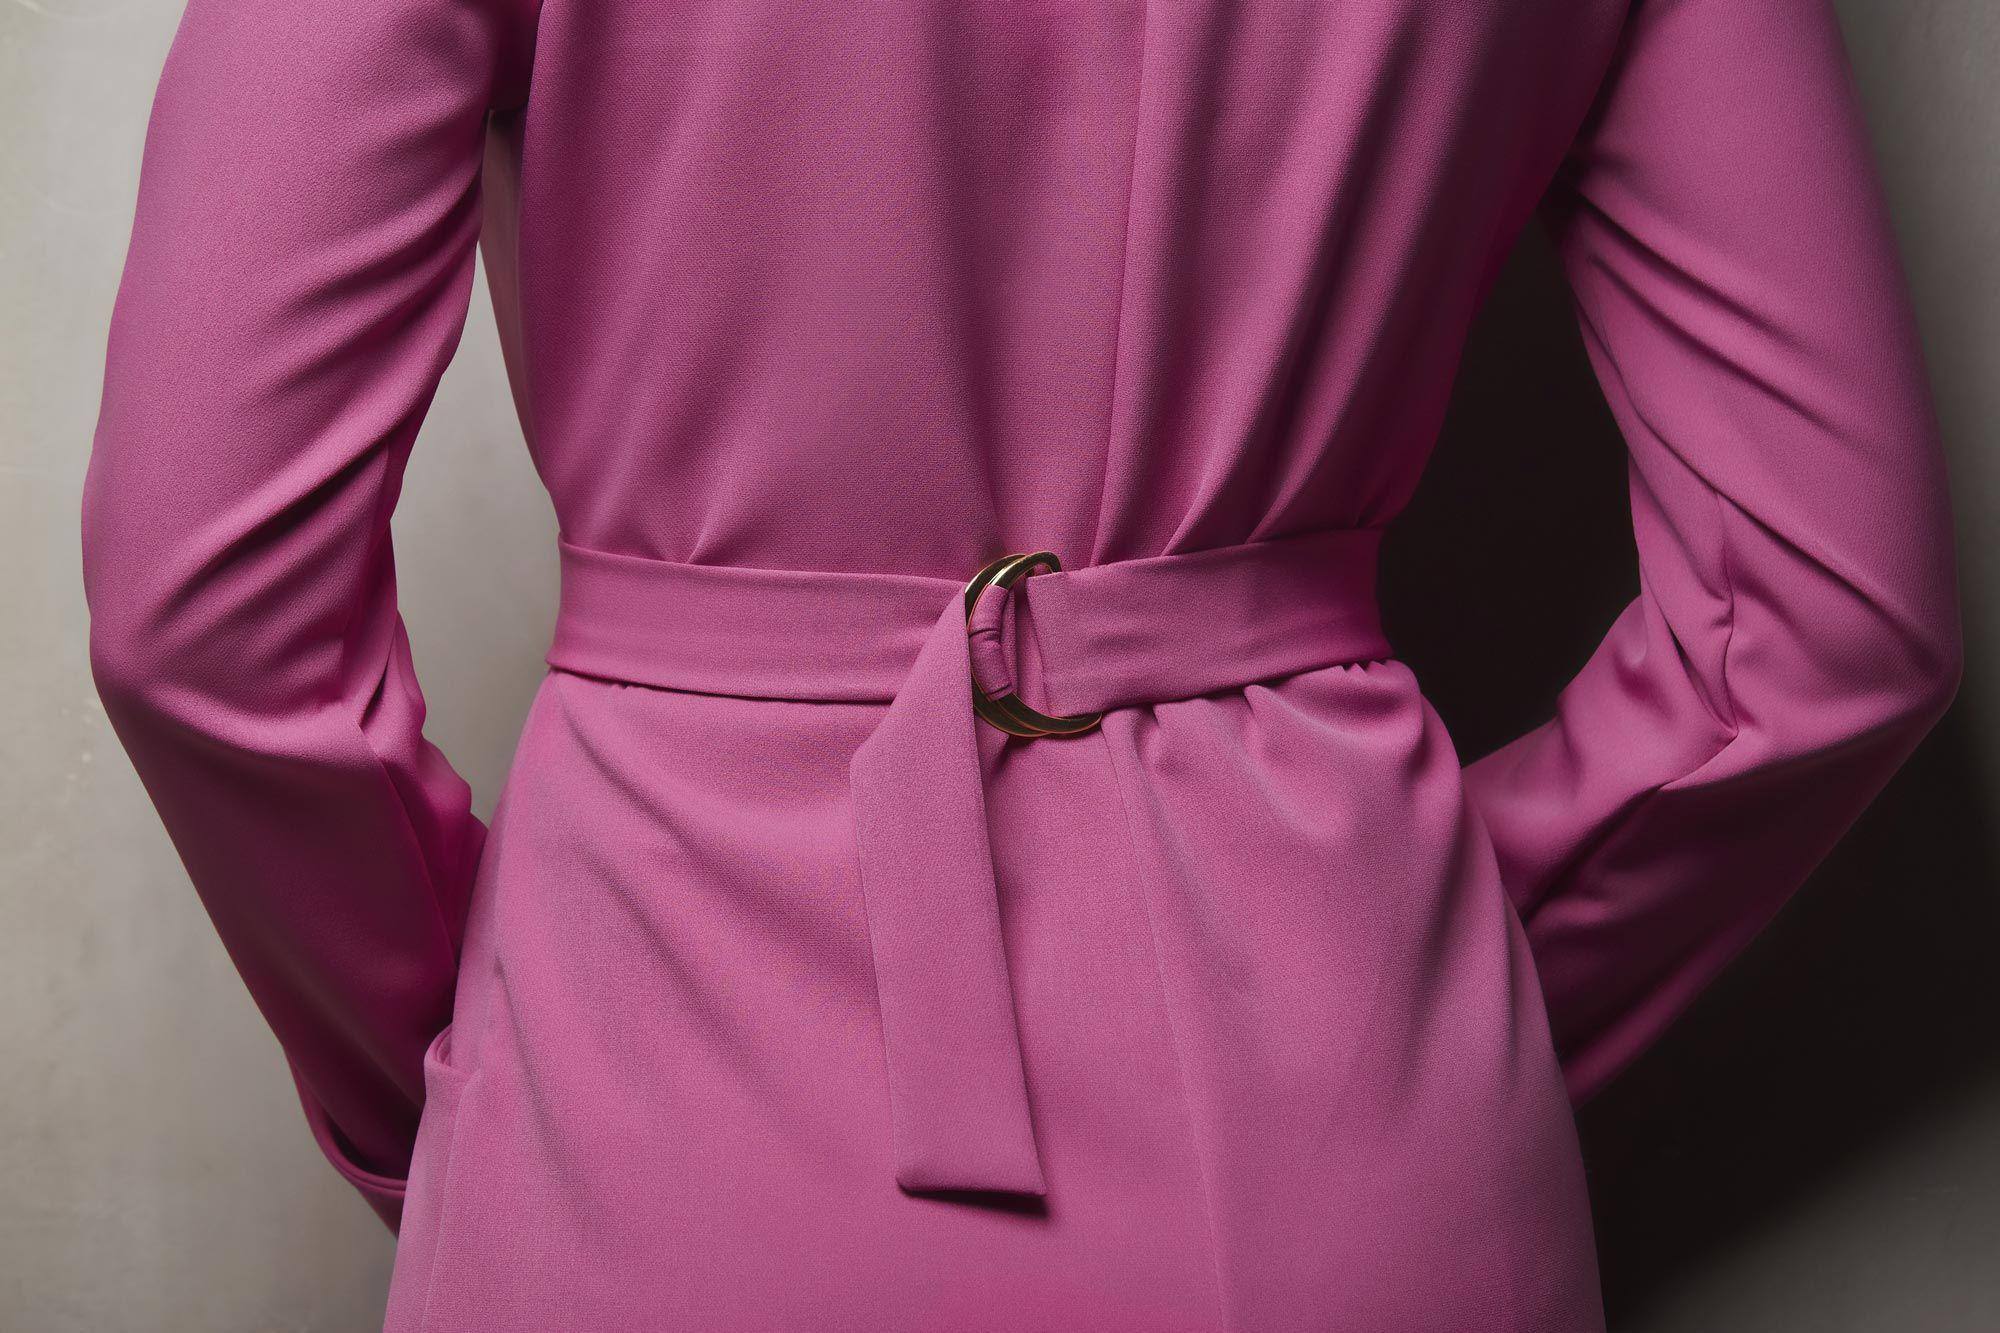 Jaleco Feminino Colorido Milenium Pink